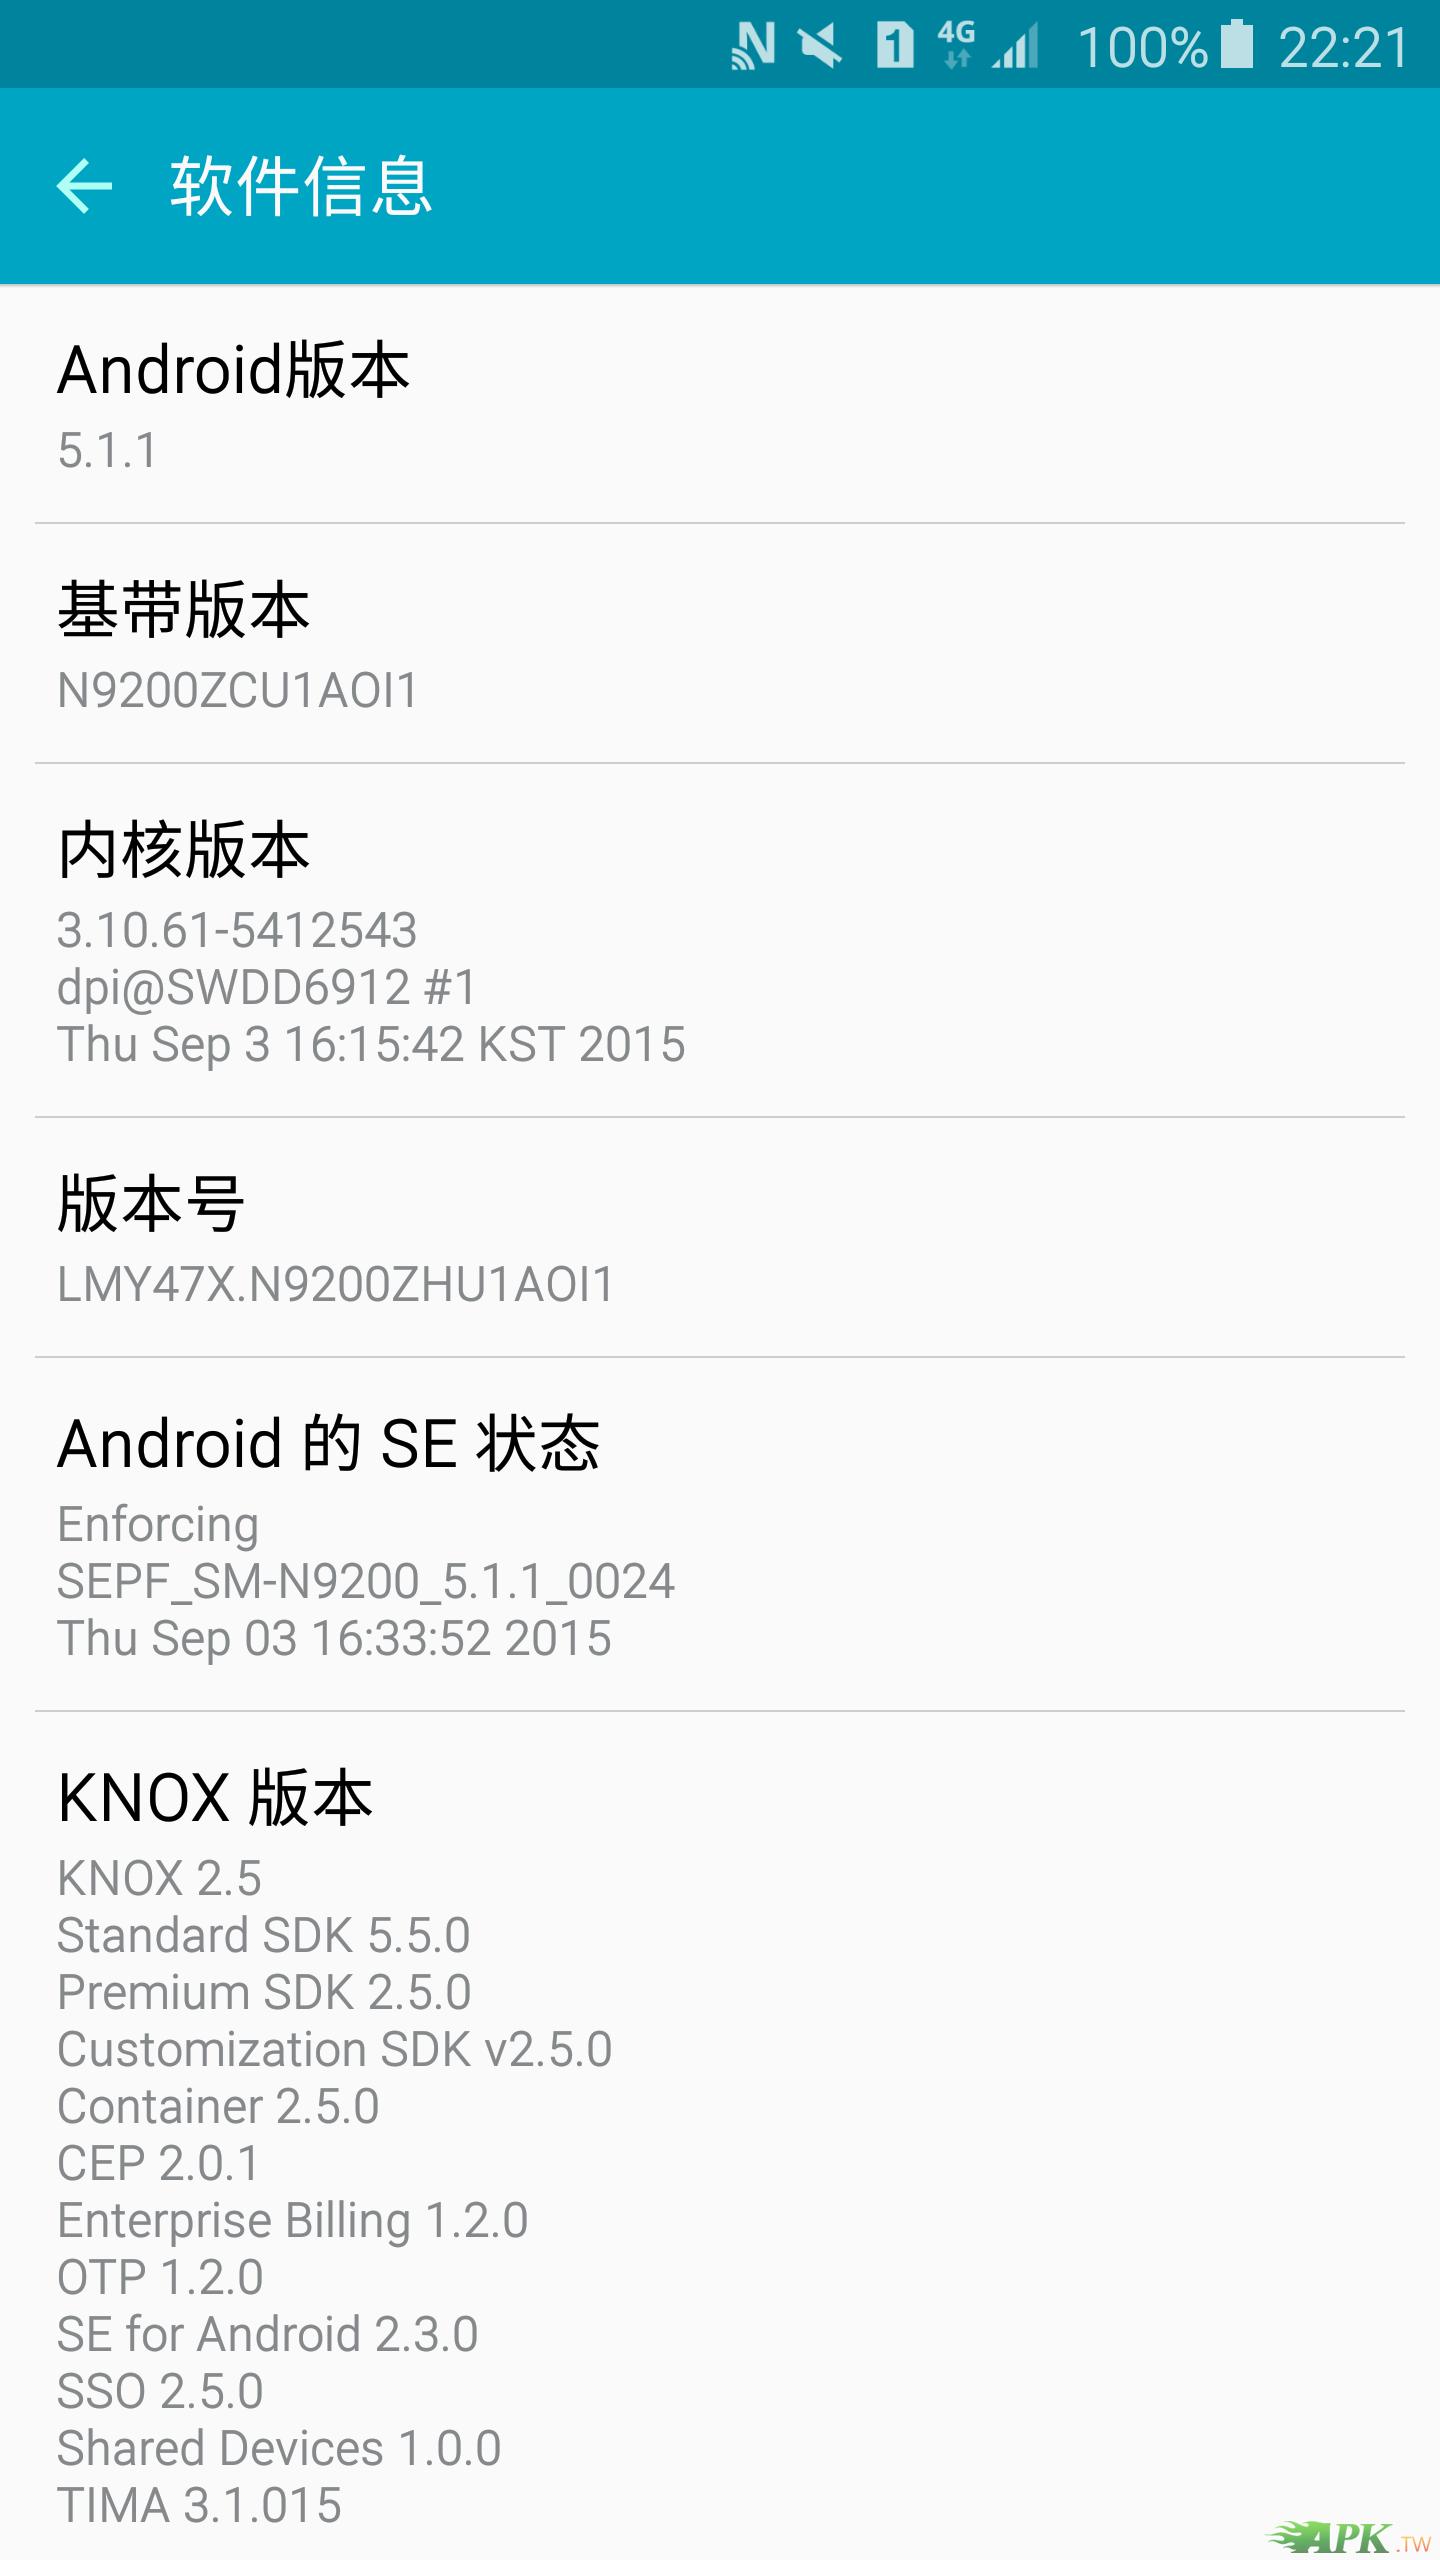 Screenshot_2015-09-20-22-21-45.png